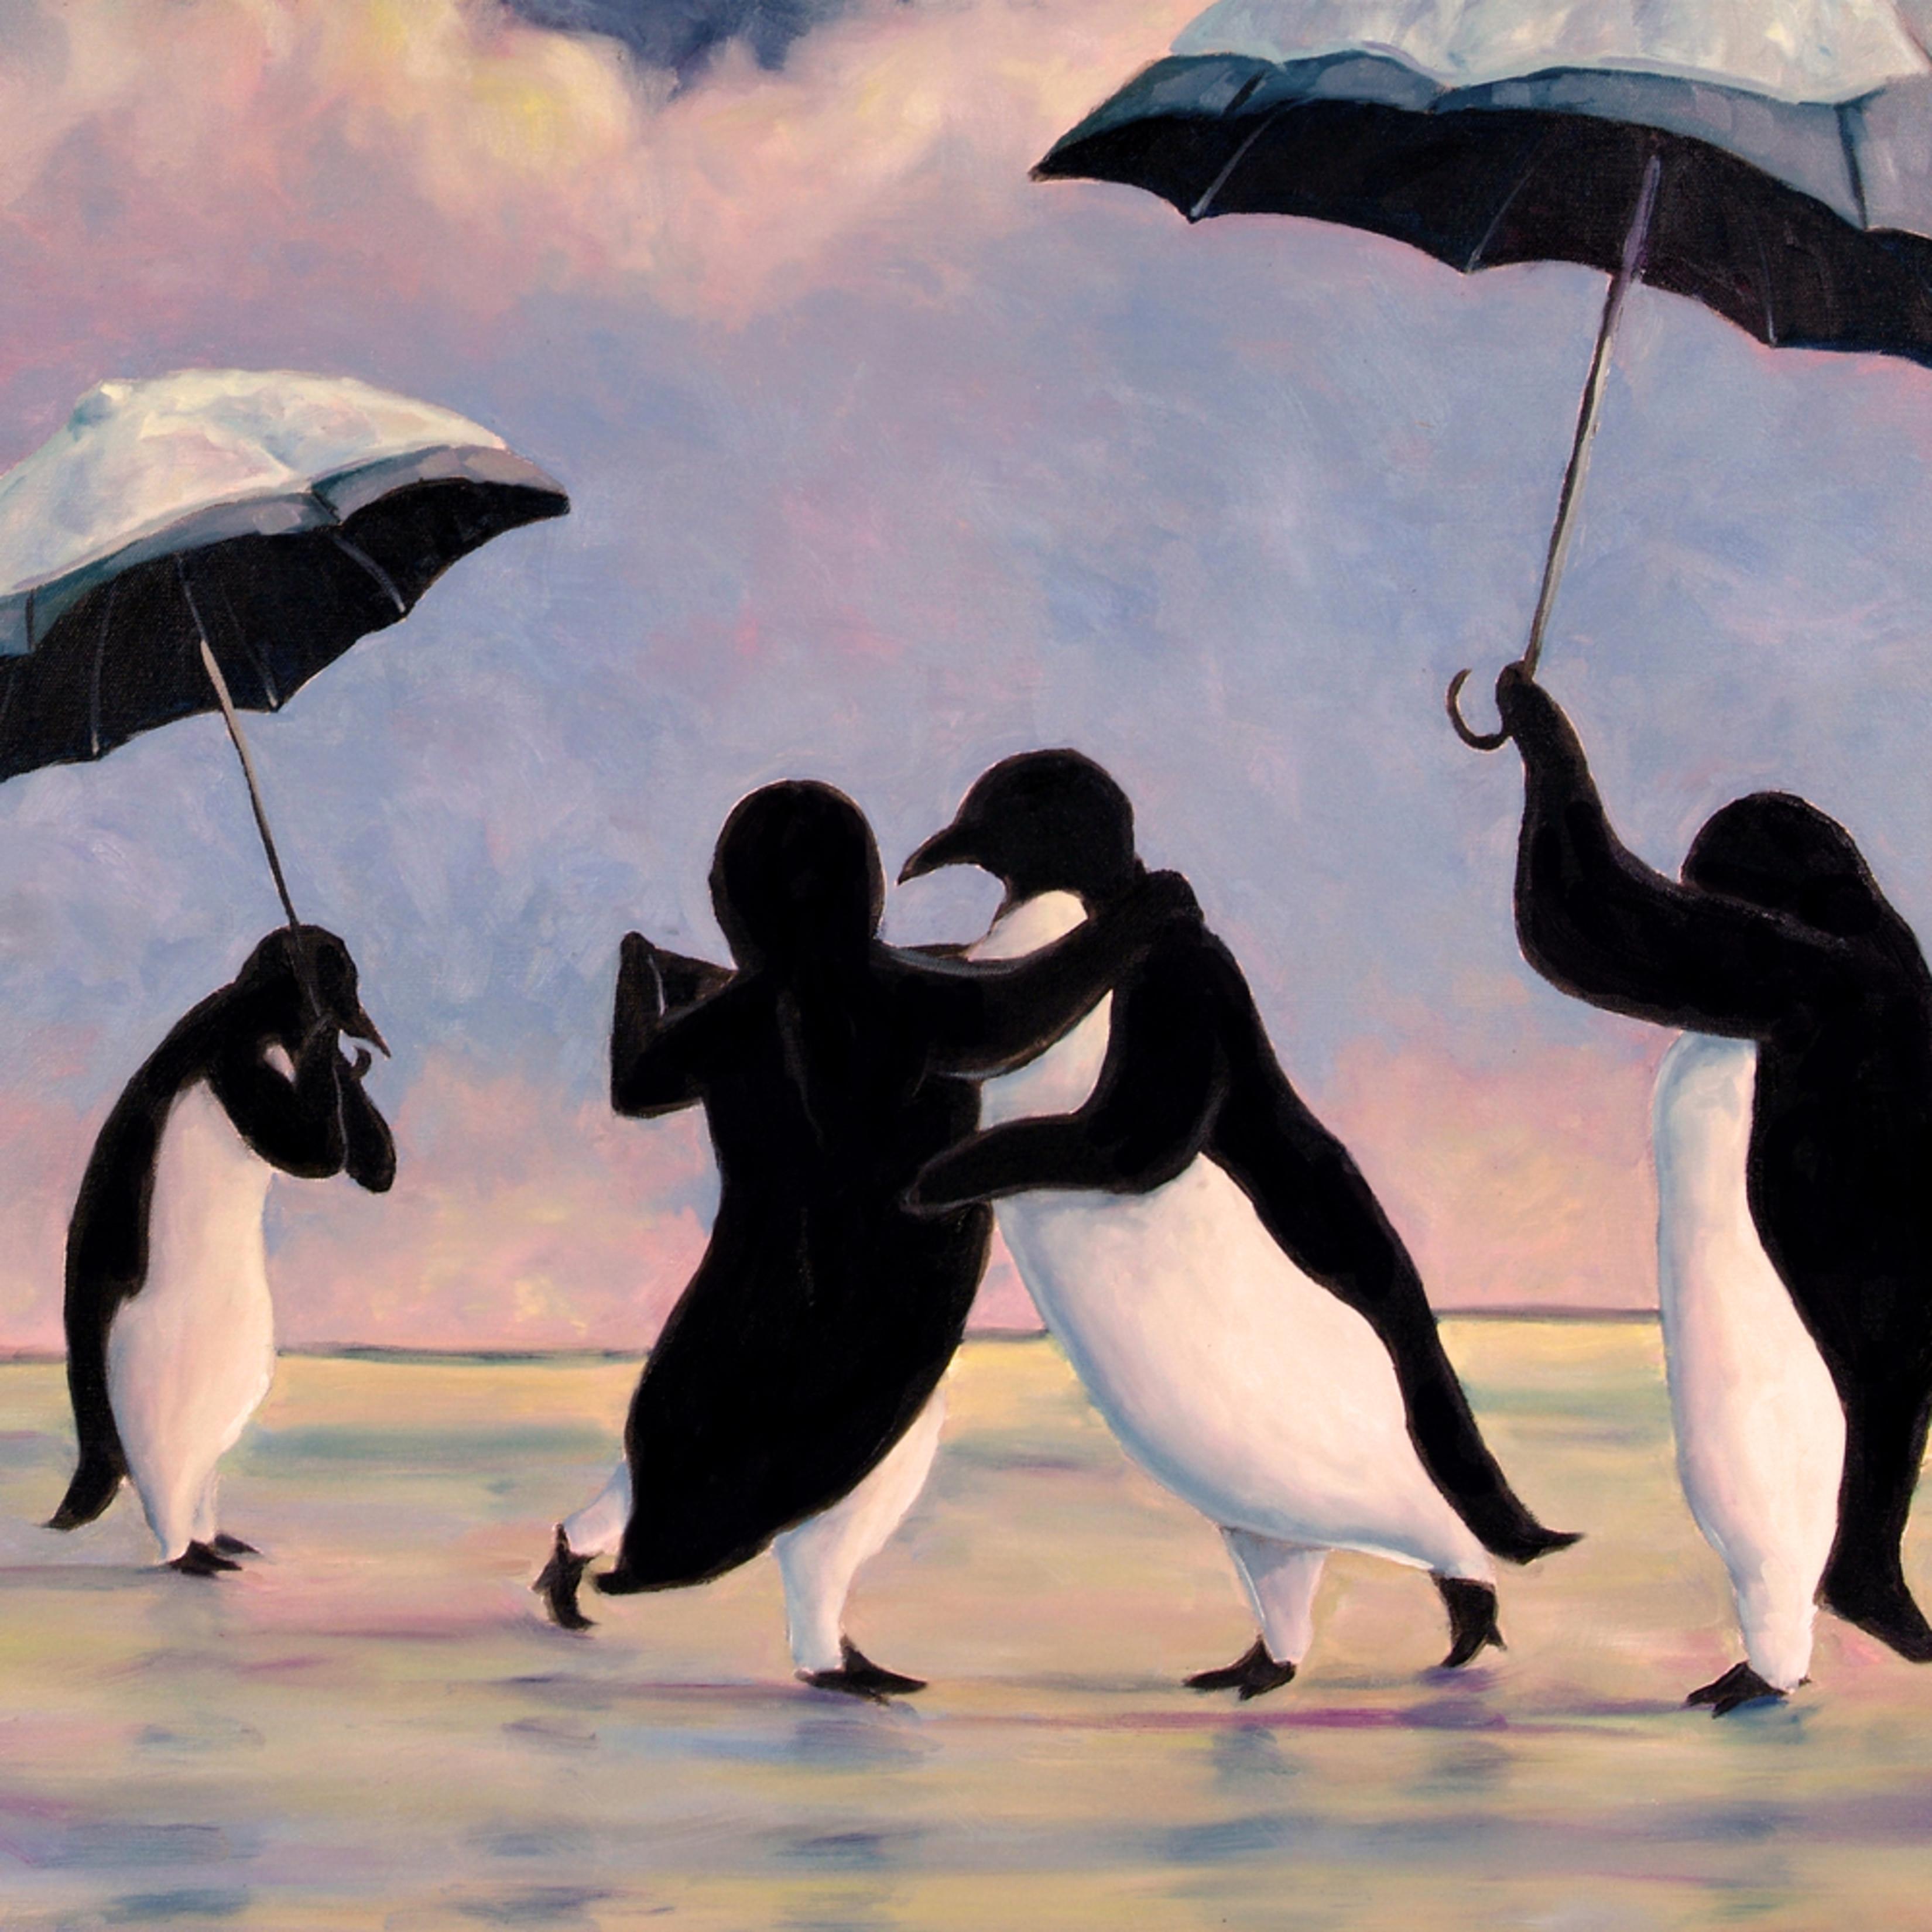 Giclee 11x14 vettriano penguins 11x14 se4sfj